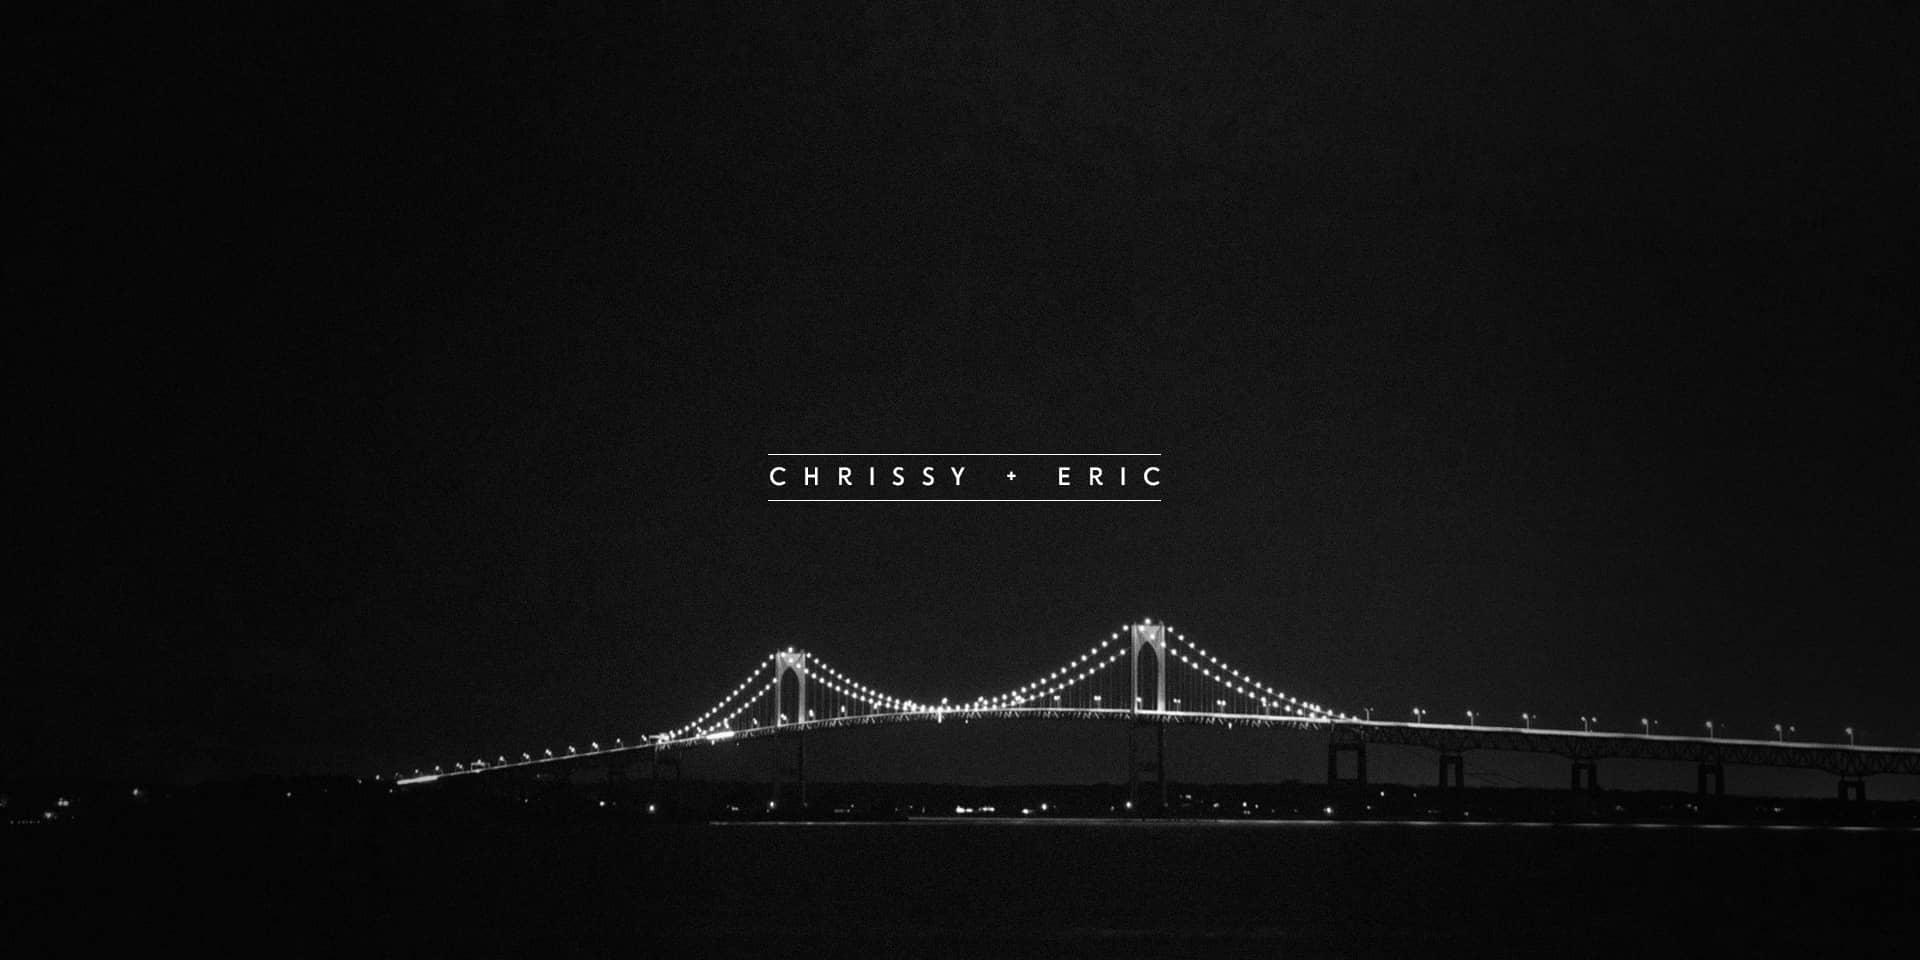 Chrissy + Eric | Newport, Rhode Island